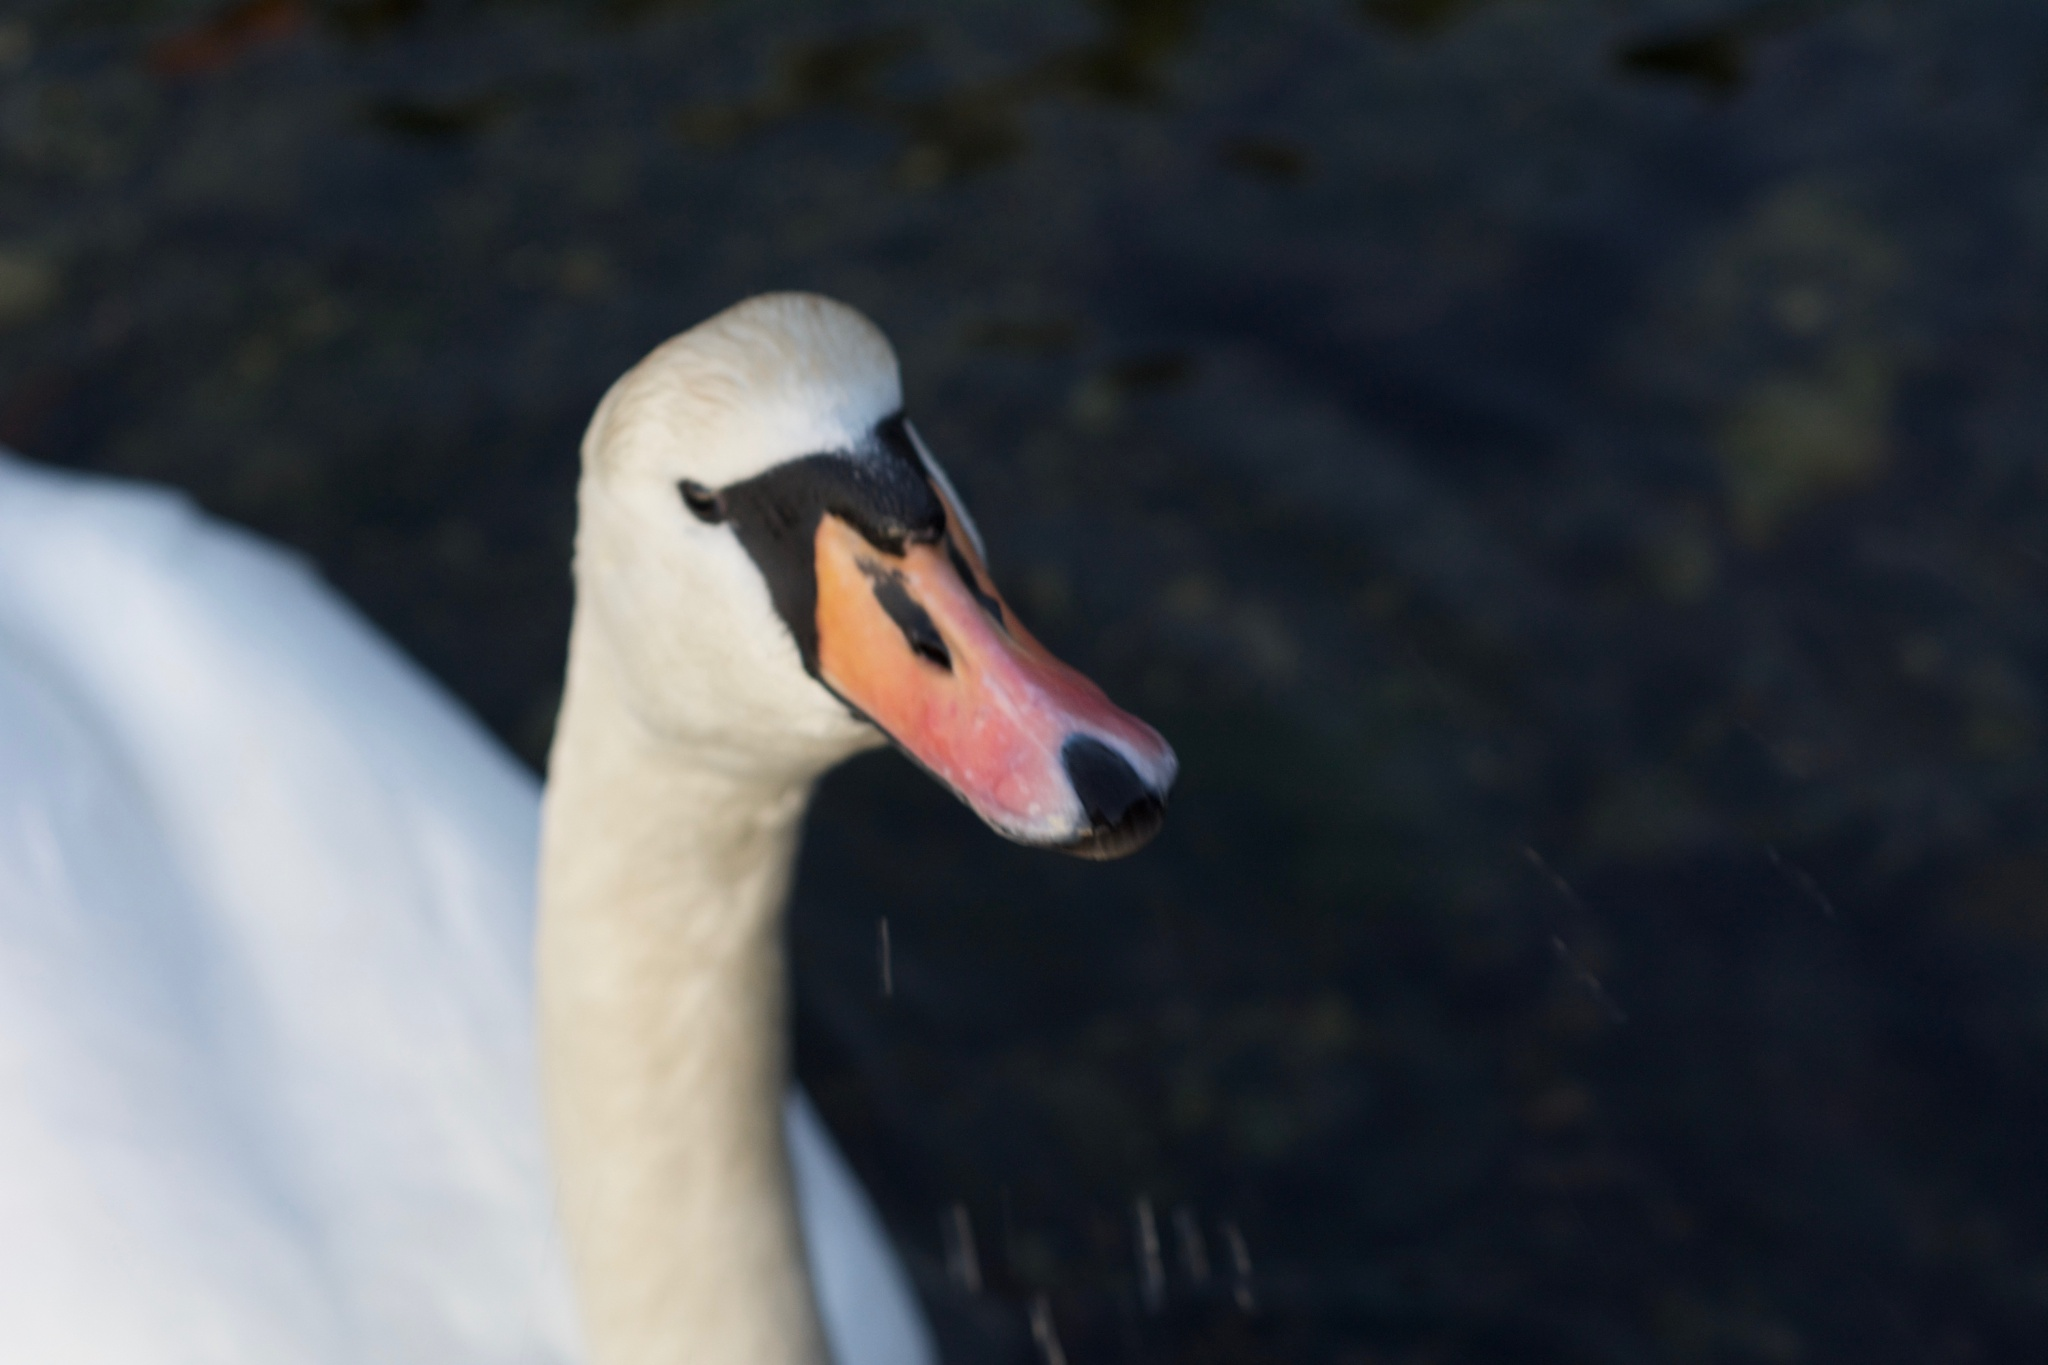 Swan close-up [2] by Lars-Toralf Utnes Storstrand